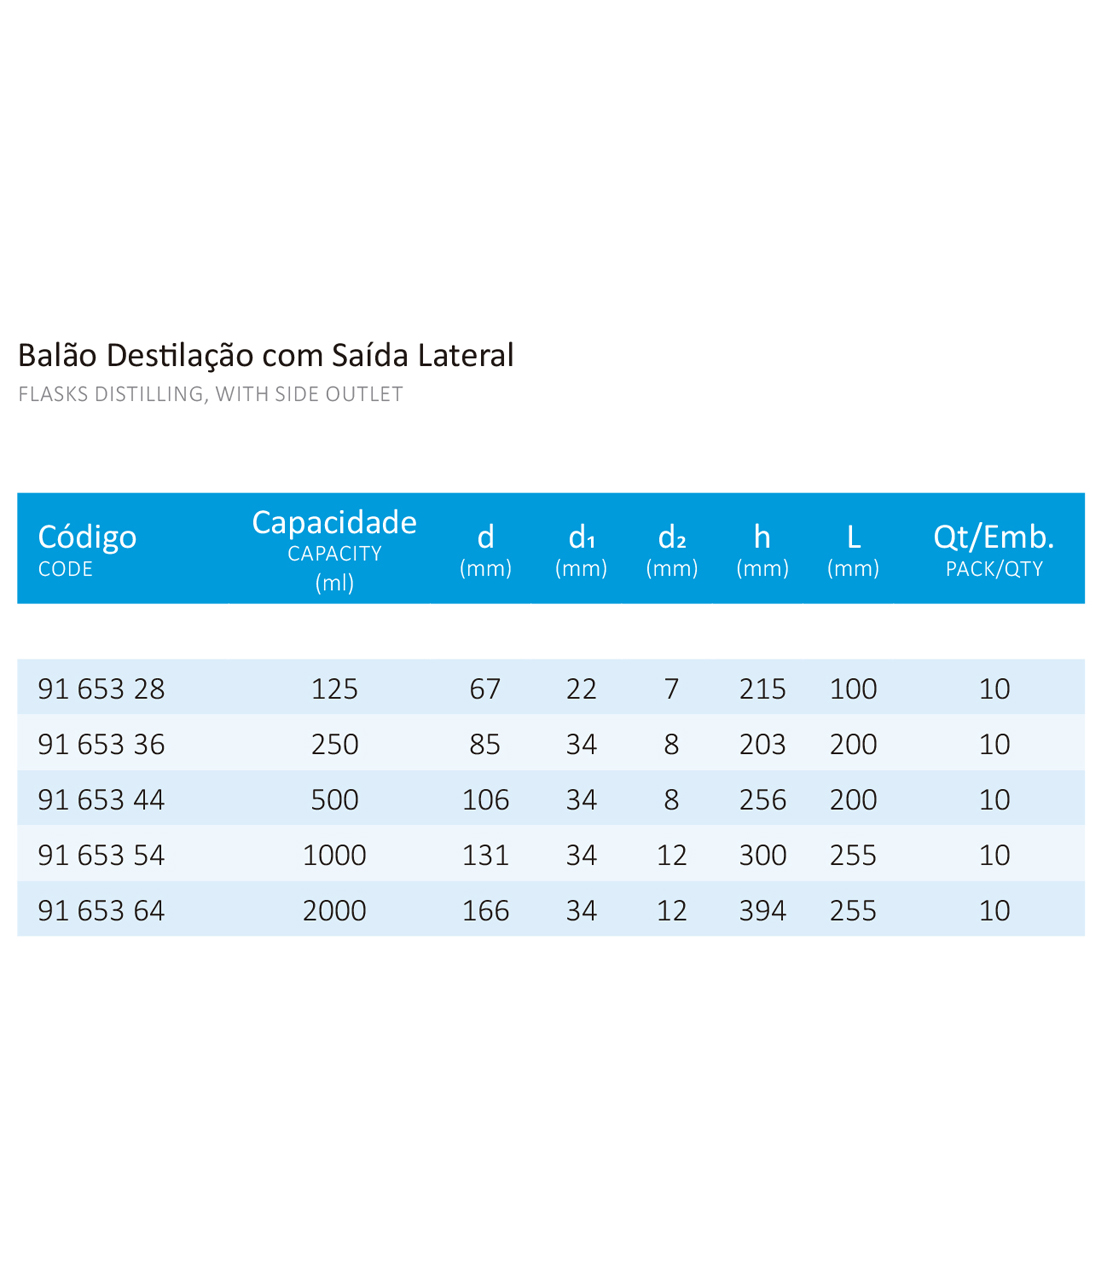 BALAO DESTILACAO SAIDA LATERAL 2000 ML - Laborglas - Cód. 9165364